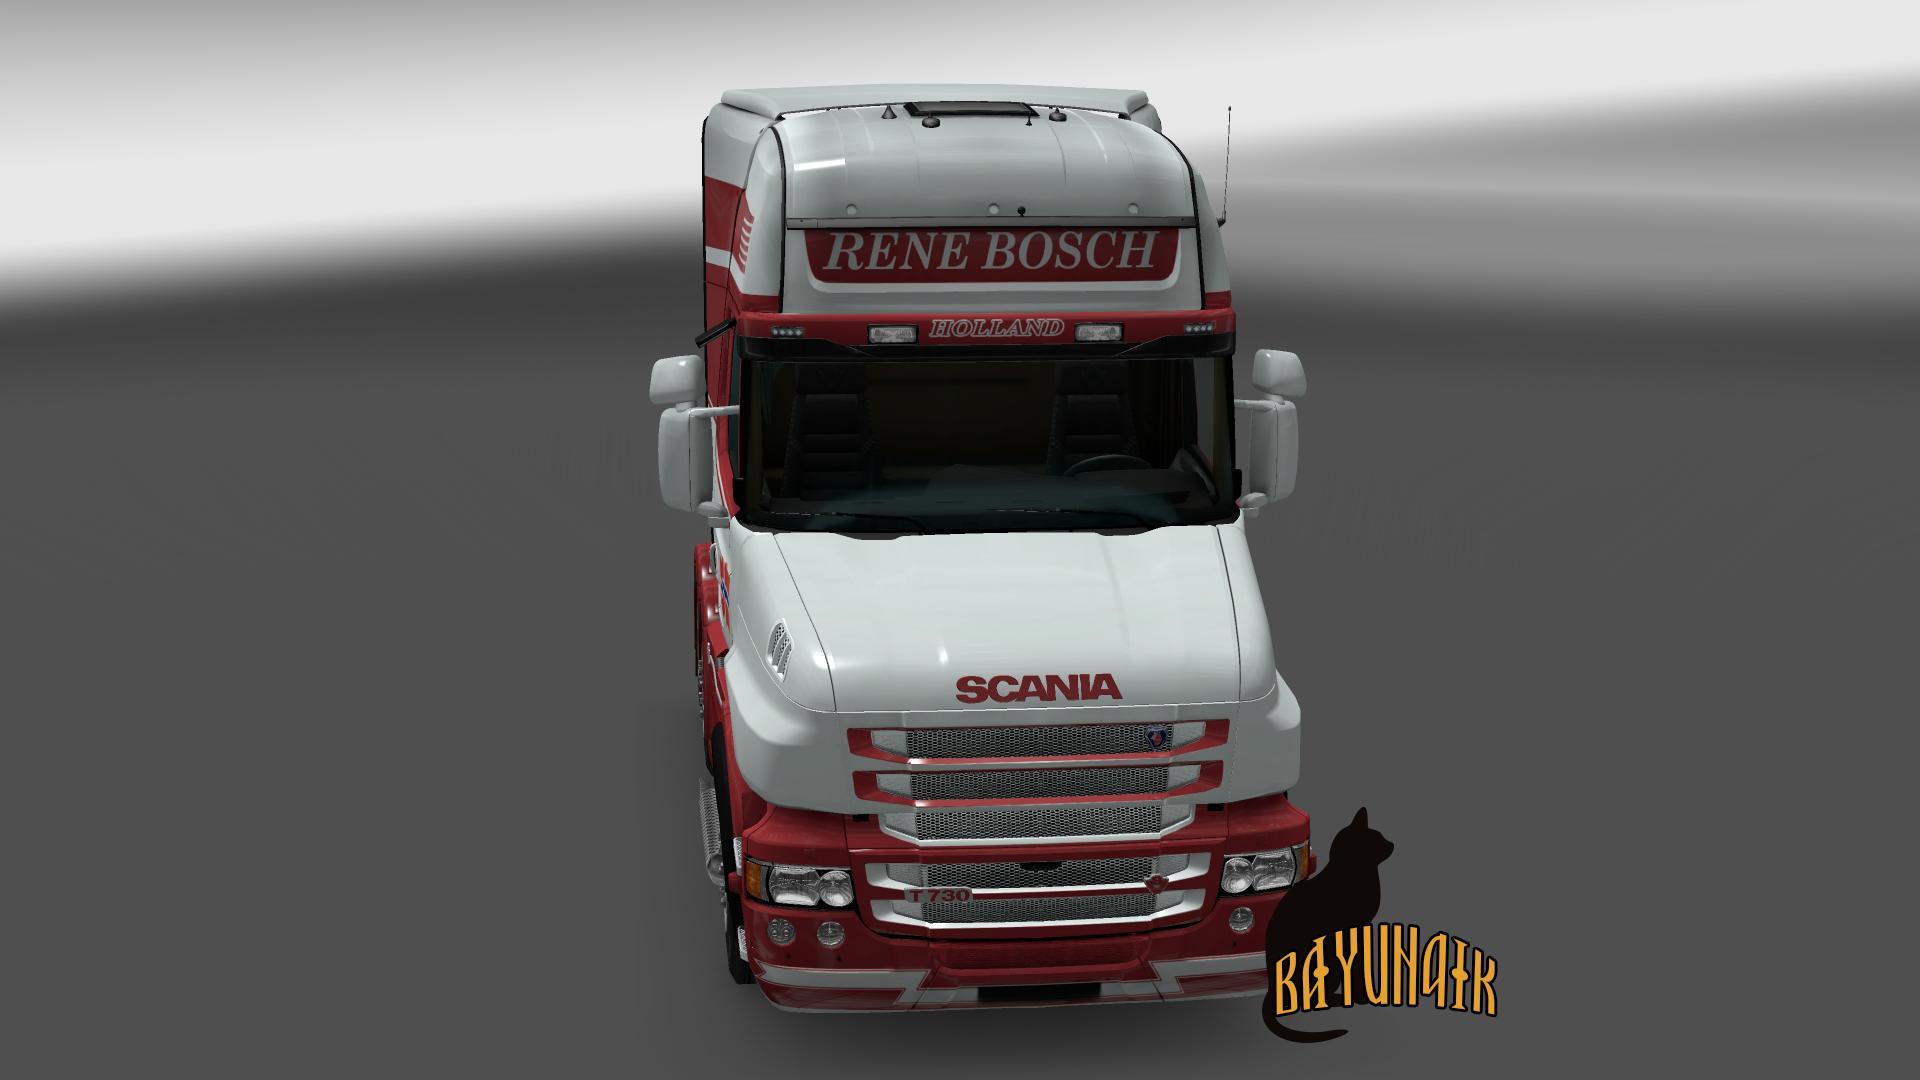 Scania t series topline rene bosch skin 124 mod euro truck scania t series topline rene bosch skin 124 mod cheapraybanclubmaster Gallery